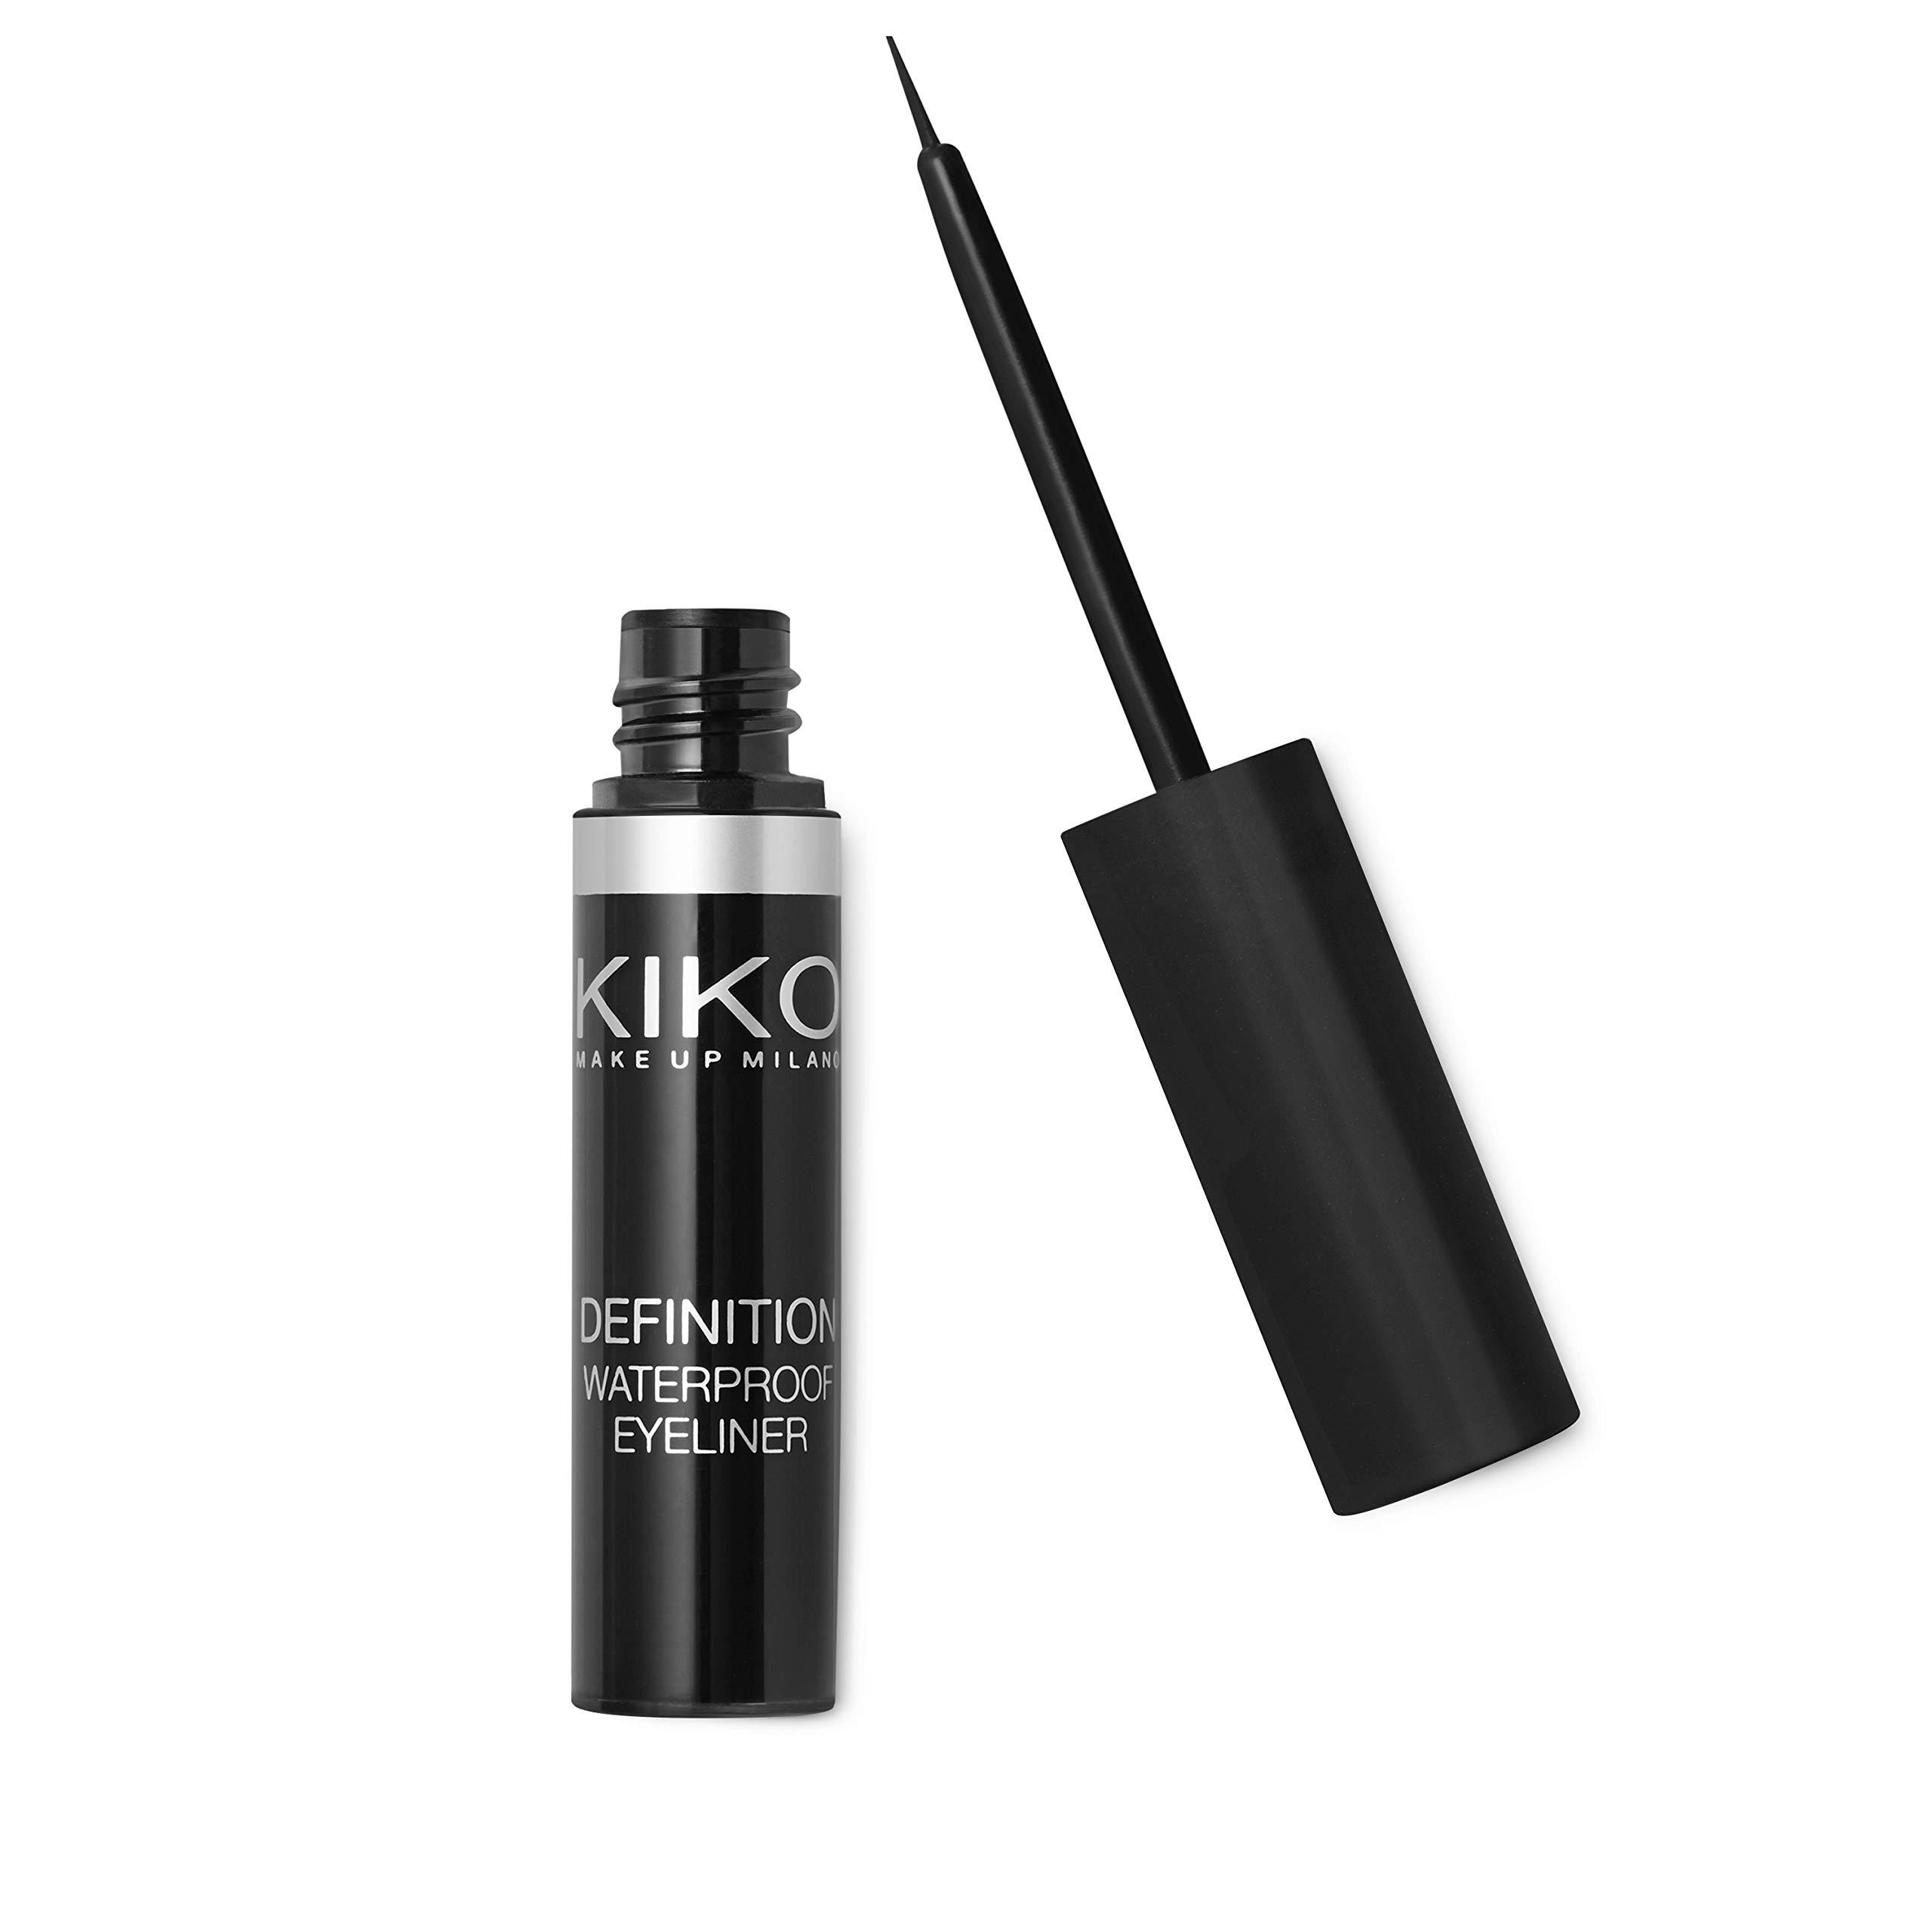 KIKO MILANO - Definition Waterproof Eyeliner - Long Lasting Liquid Eyeliner Black   Water Resistant   Hypoallergenic Eyeliner   Professional Cruelty Free Makeup   Made in Italy